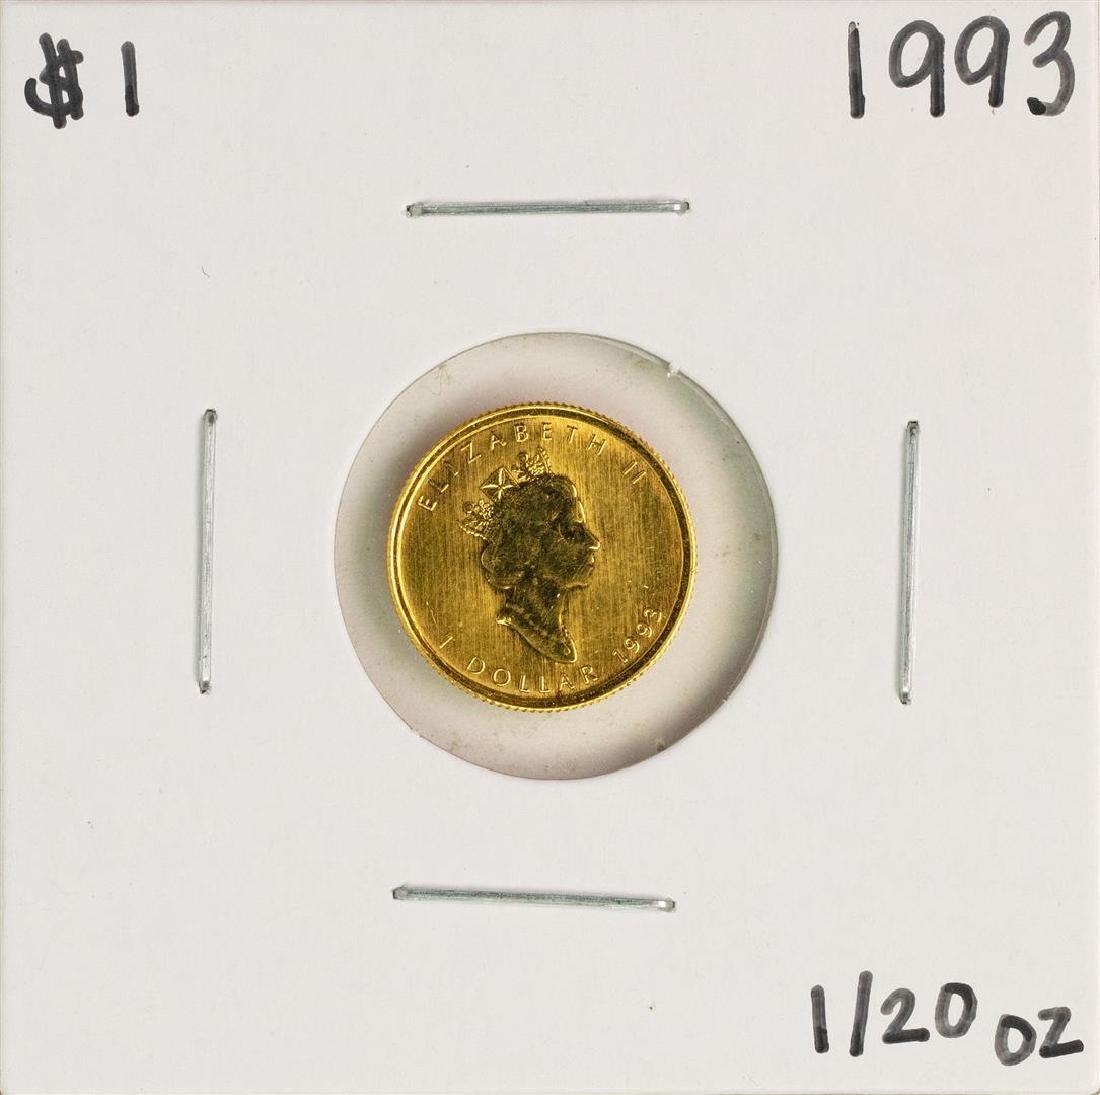 1993 $1 Canada Maple Leaf 1/20 oz Gold Coin